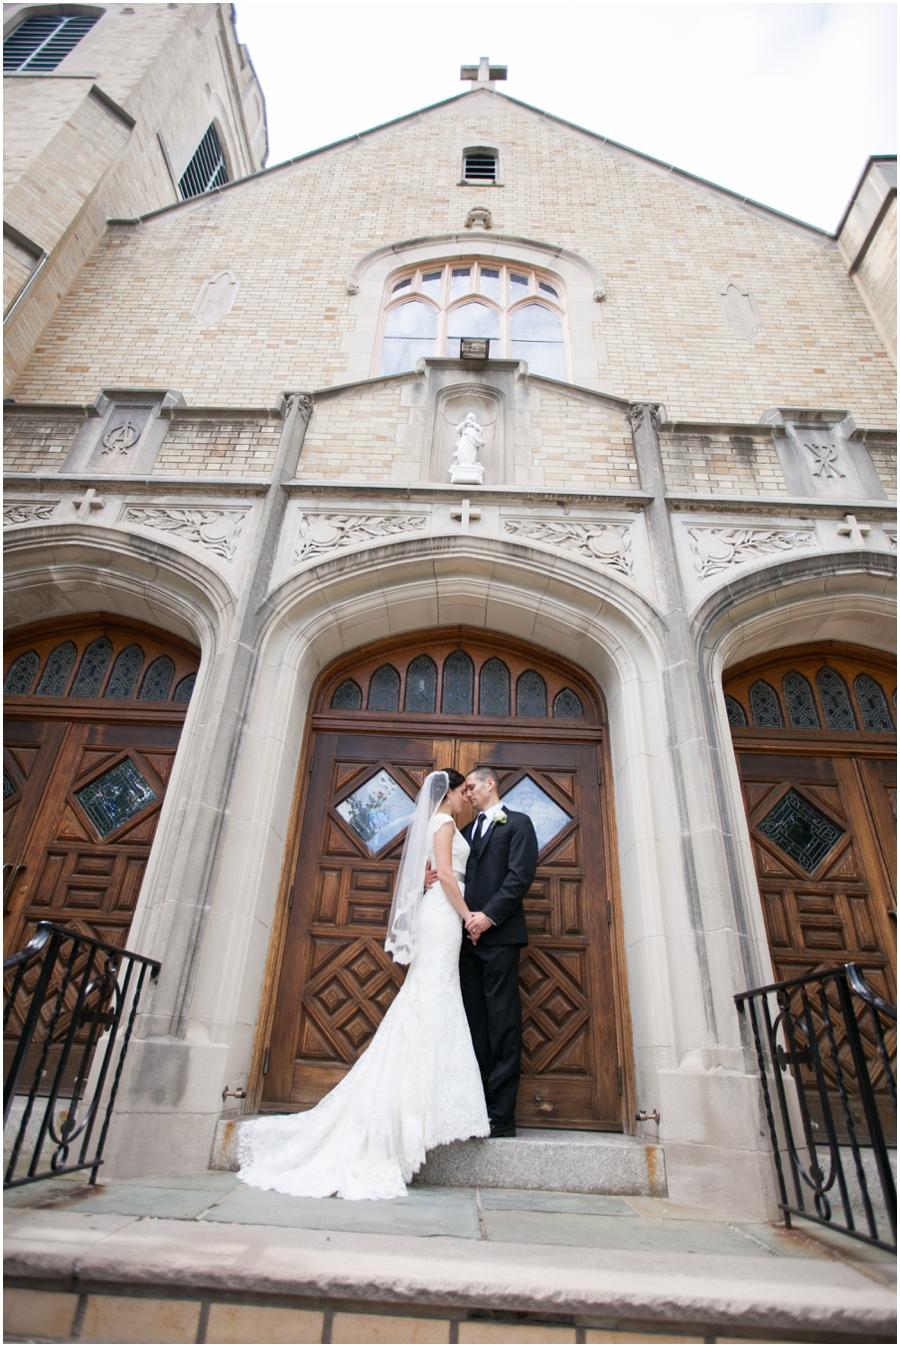 St Mary's Church Pompton Lakes Wedding Photographer - Love Portrait